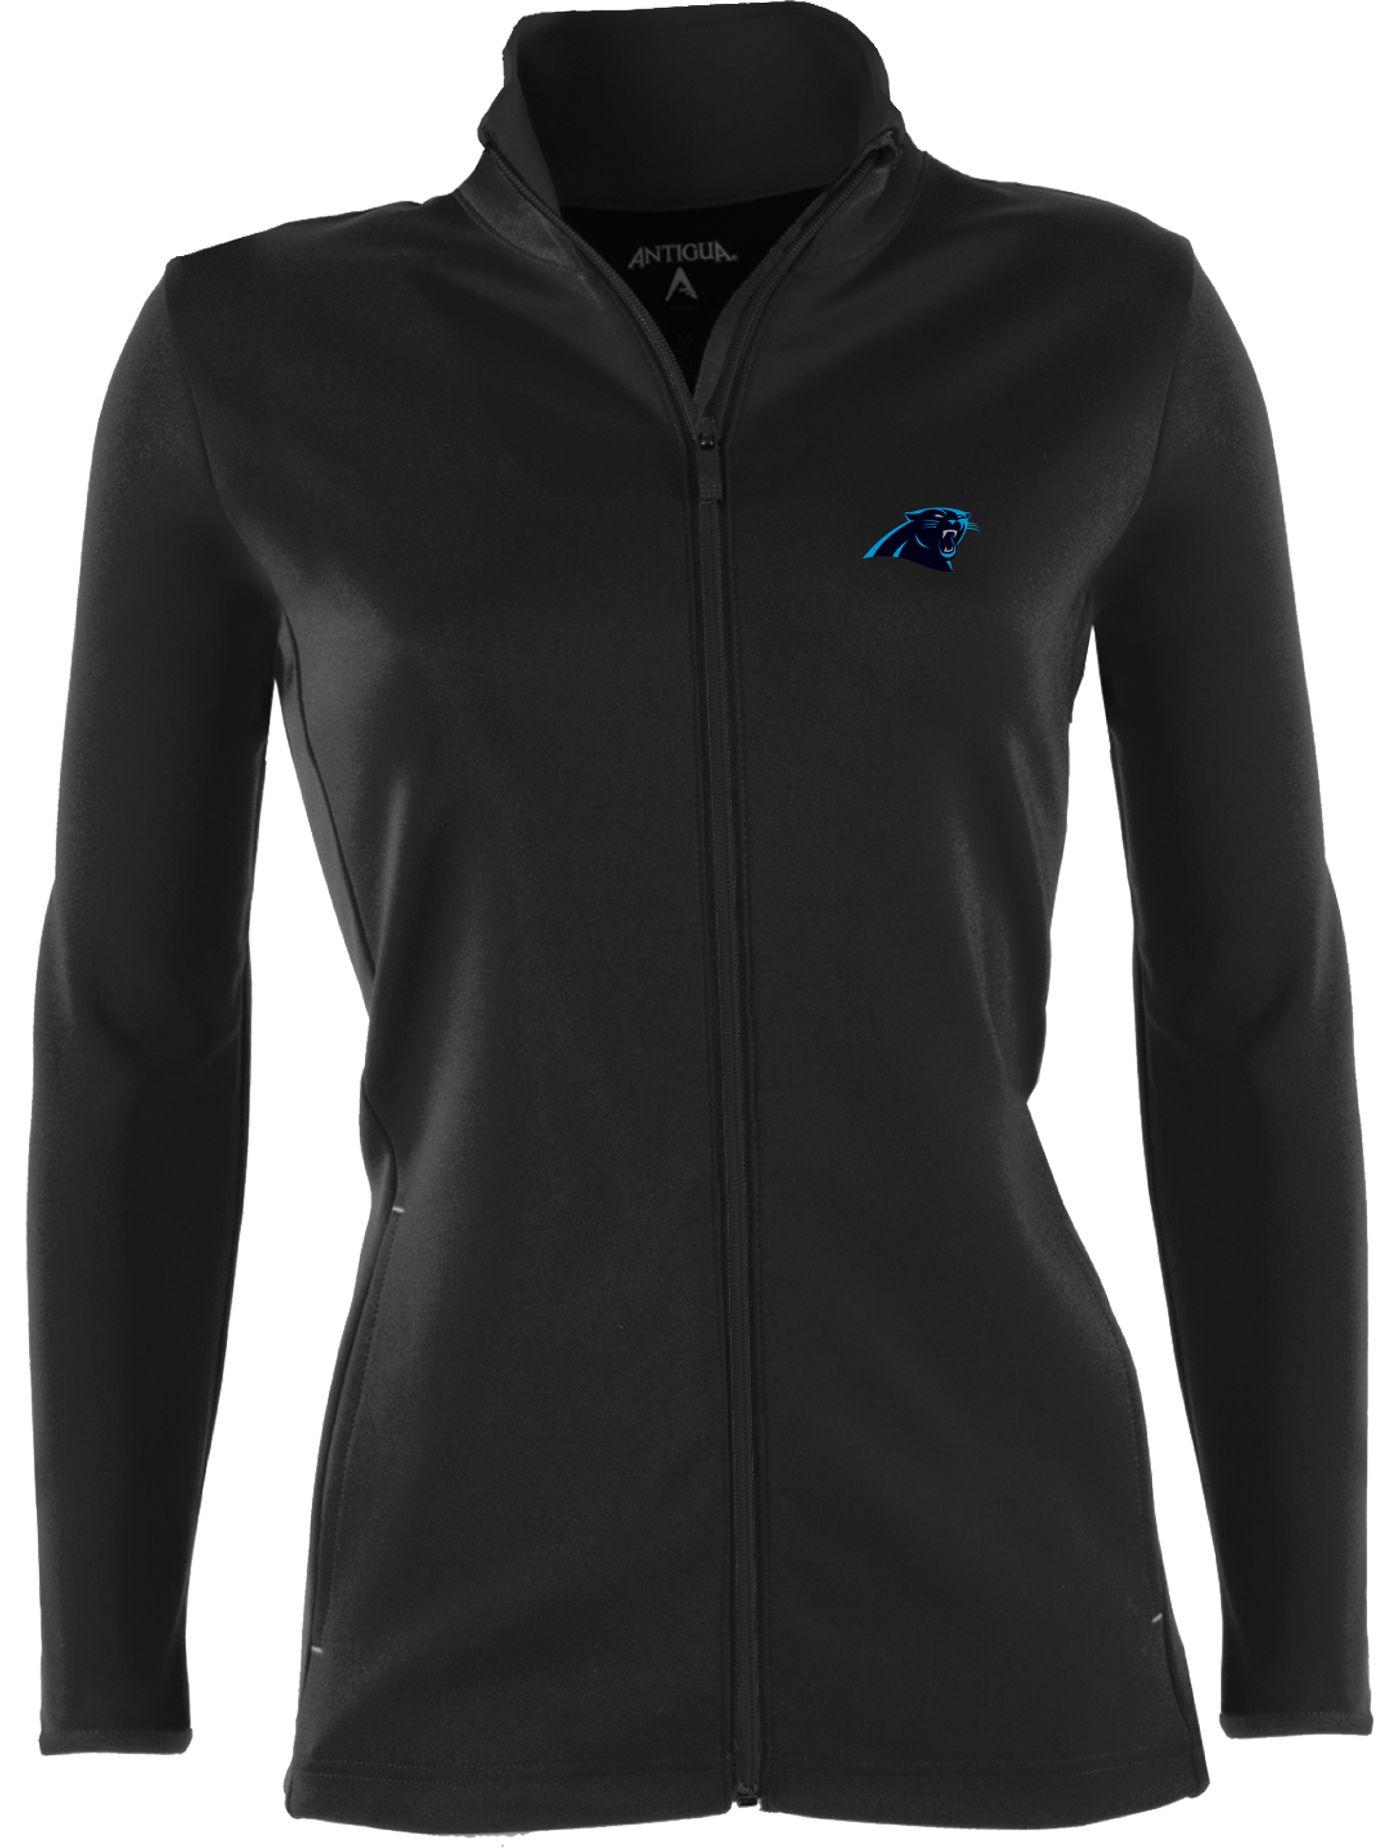 Antigua Women's Carolina Panthers Leader Black Full-Zip Jacket